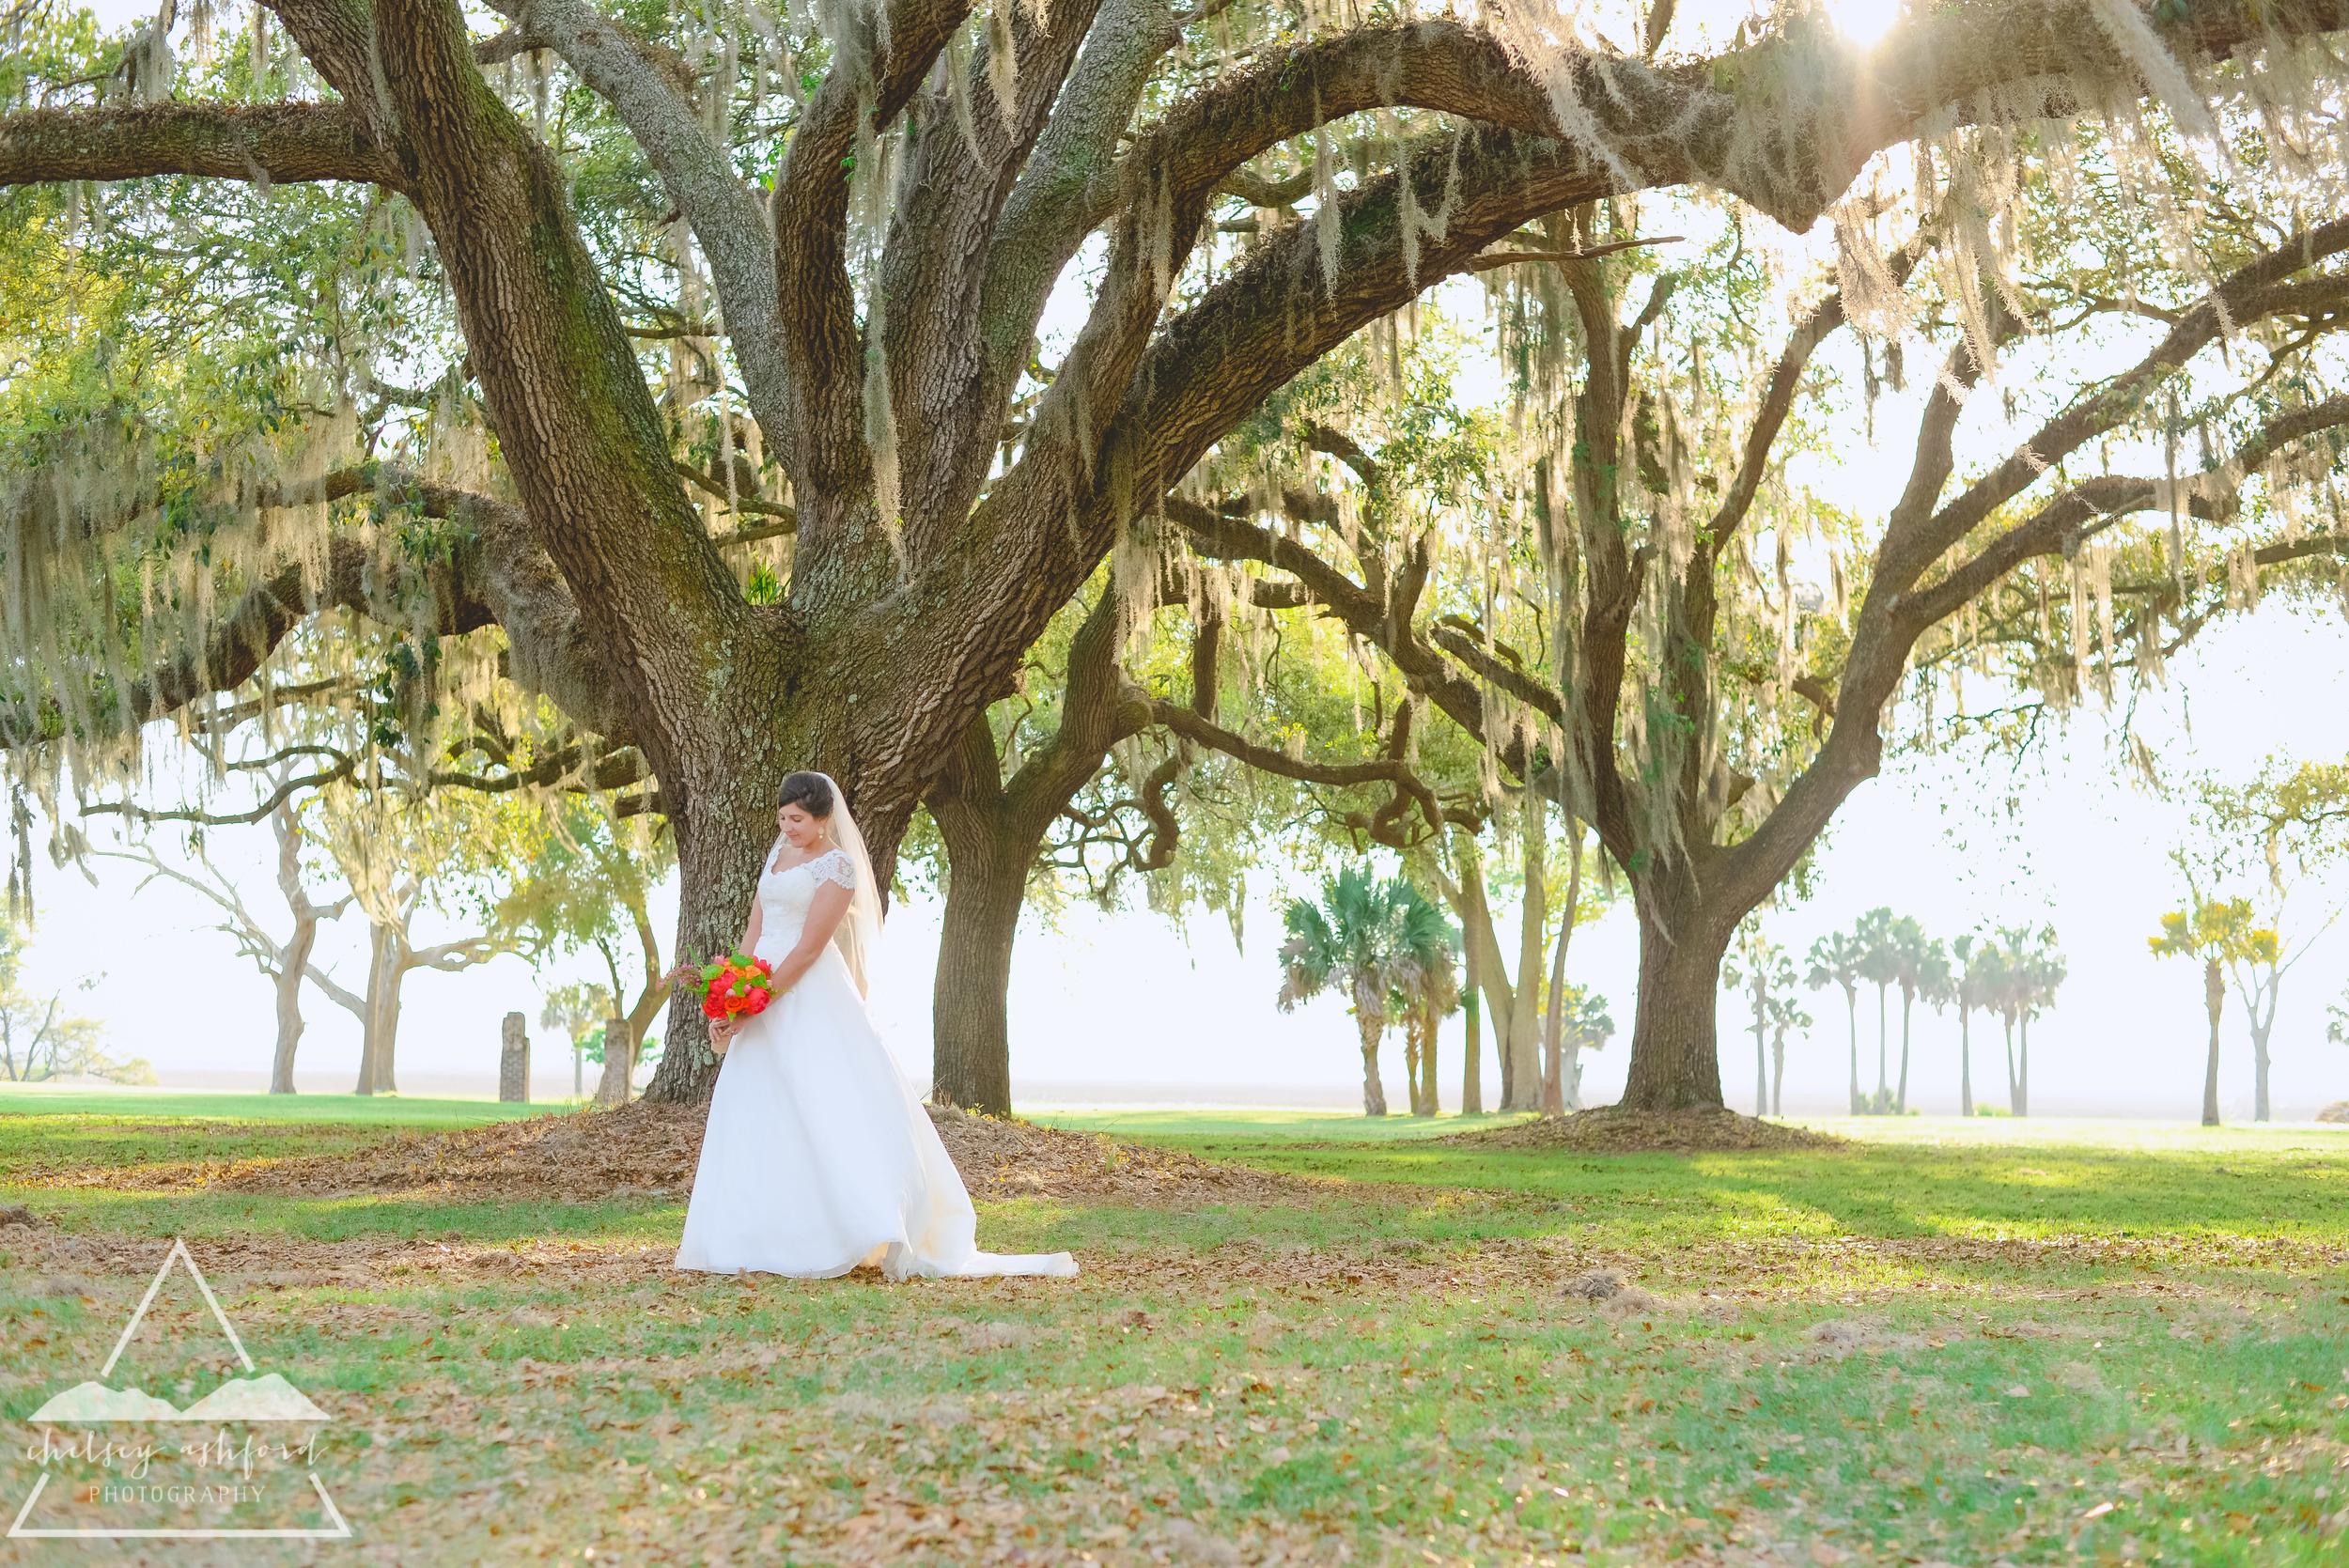 Sylvia_bridals_web-13.jpg